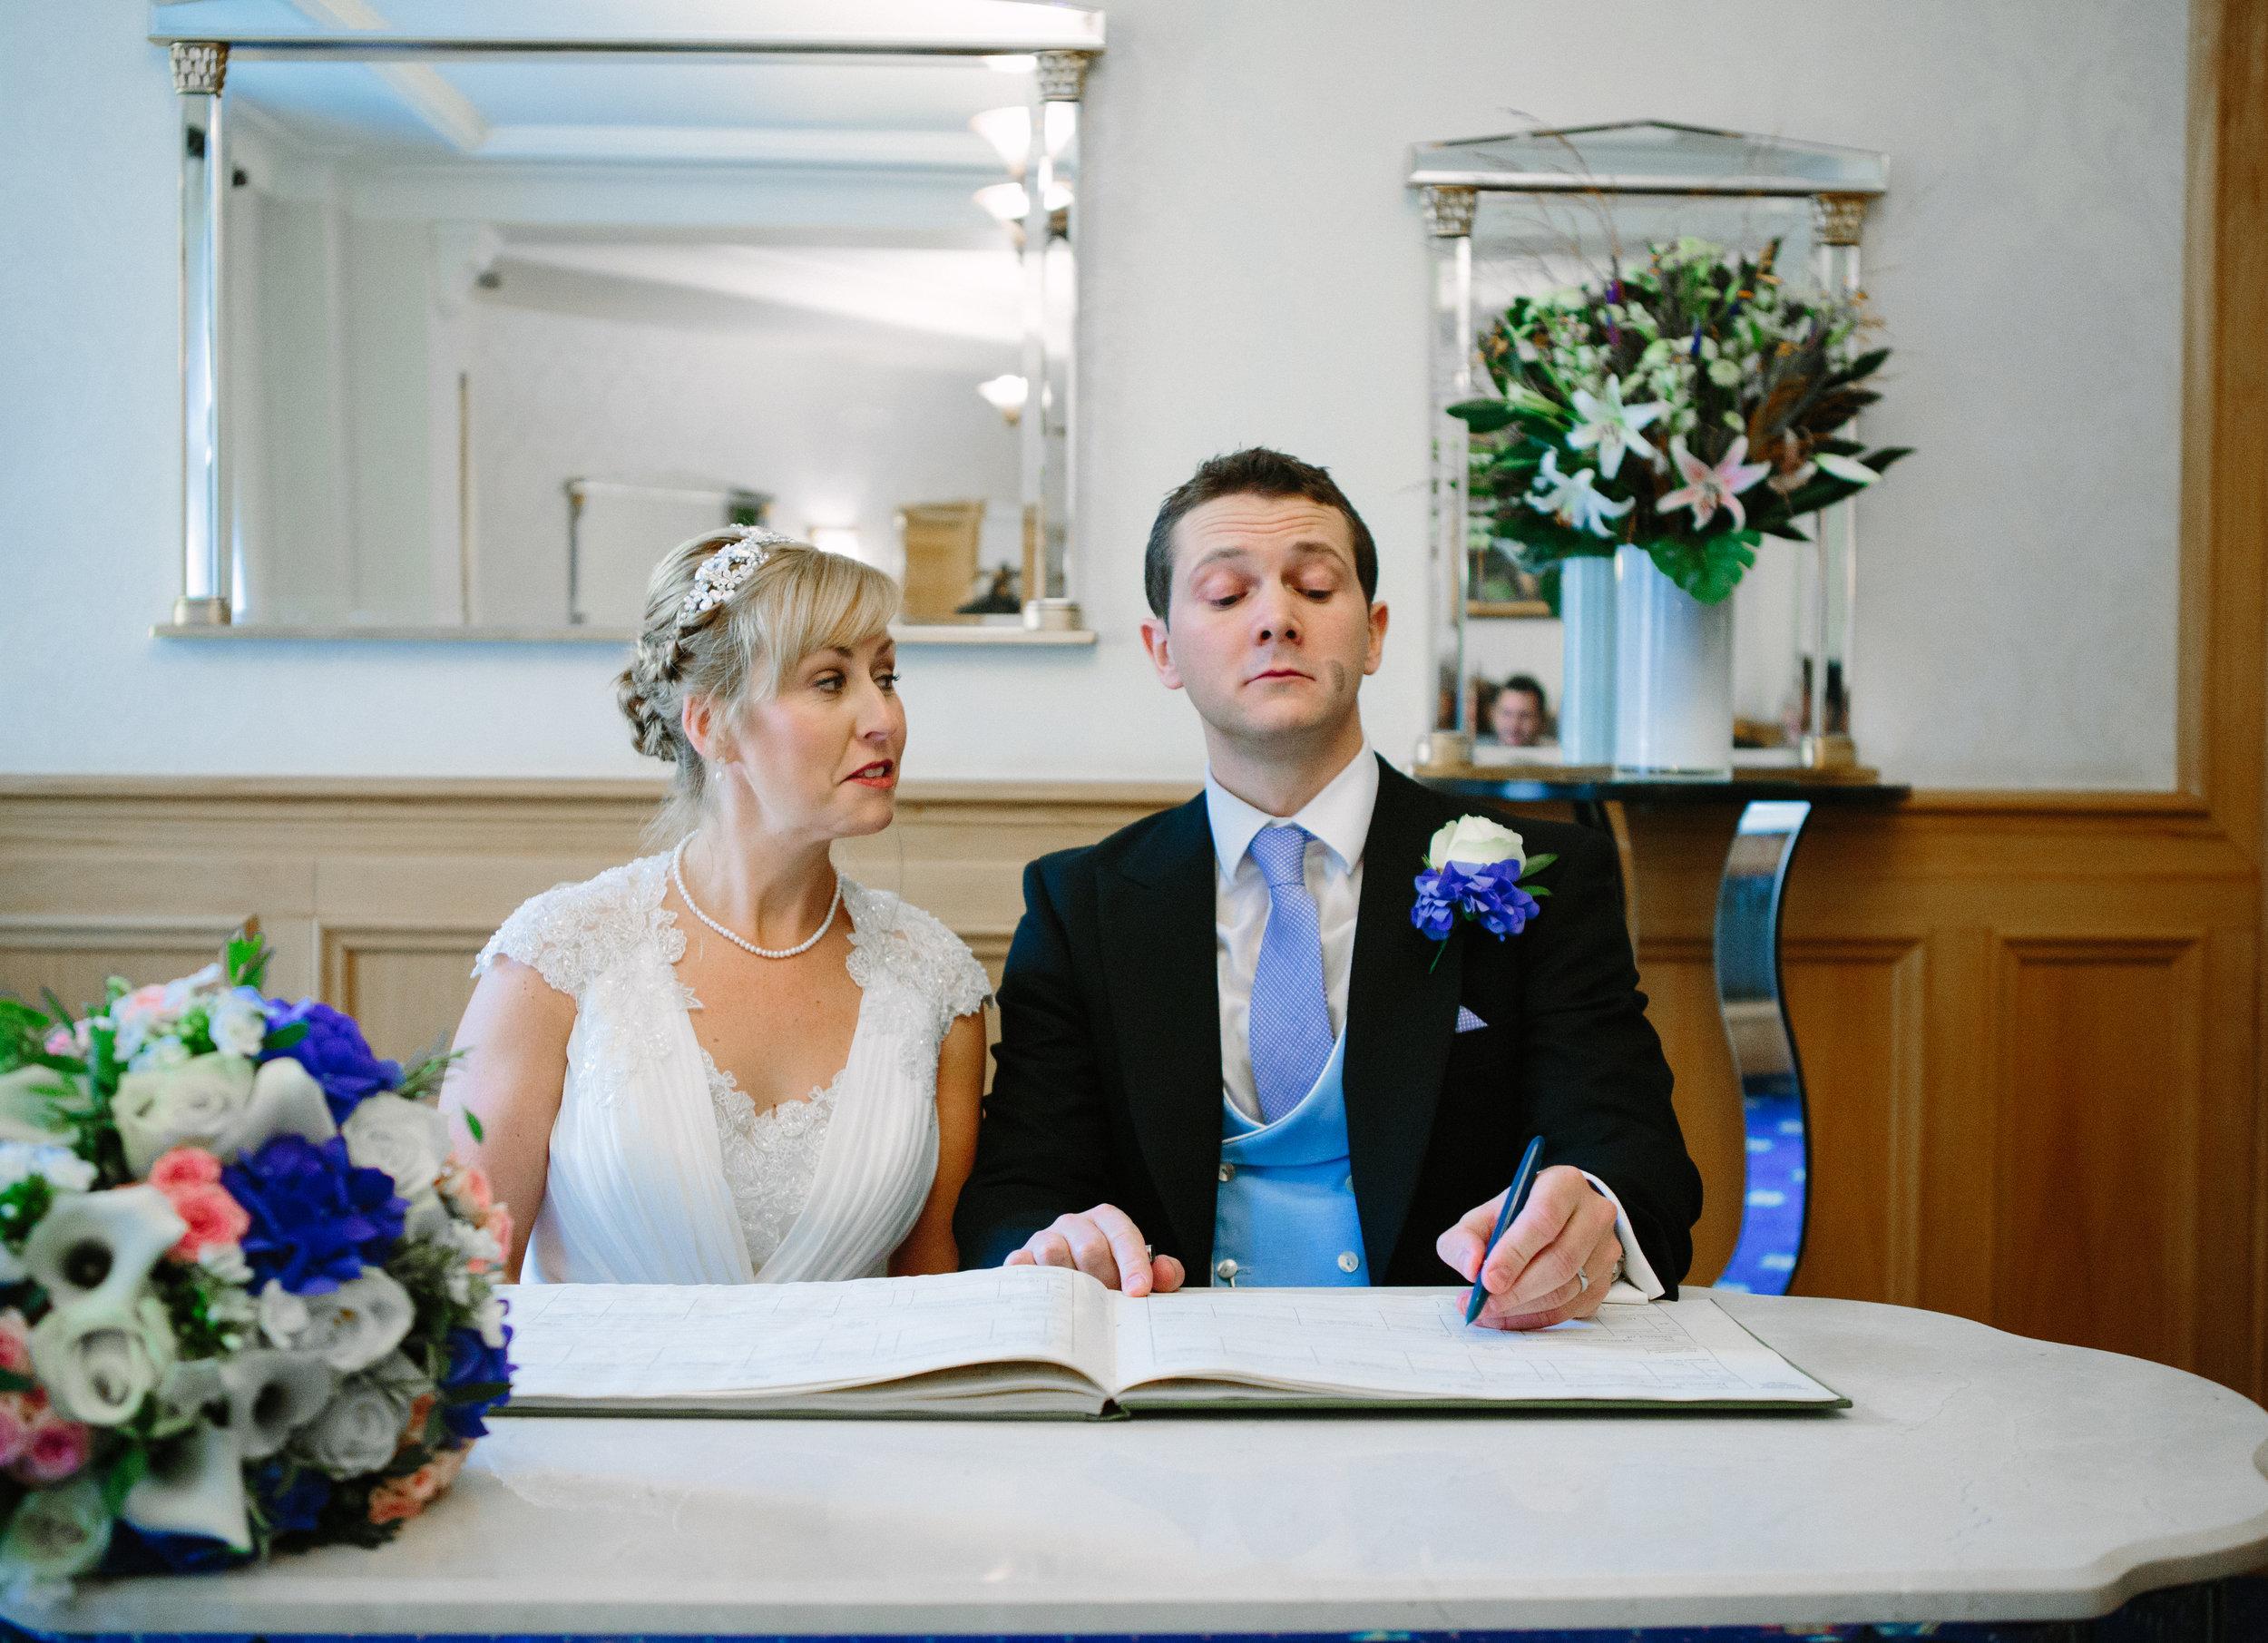 london-wedding-photography-wimbledon-wandsworth-town-hall-savoy-hotel-register-sign-36